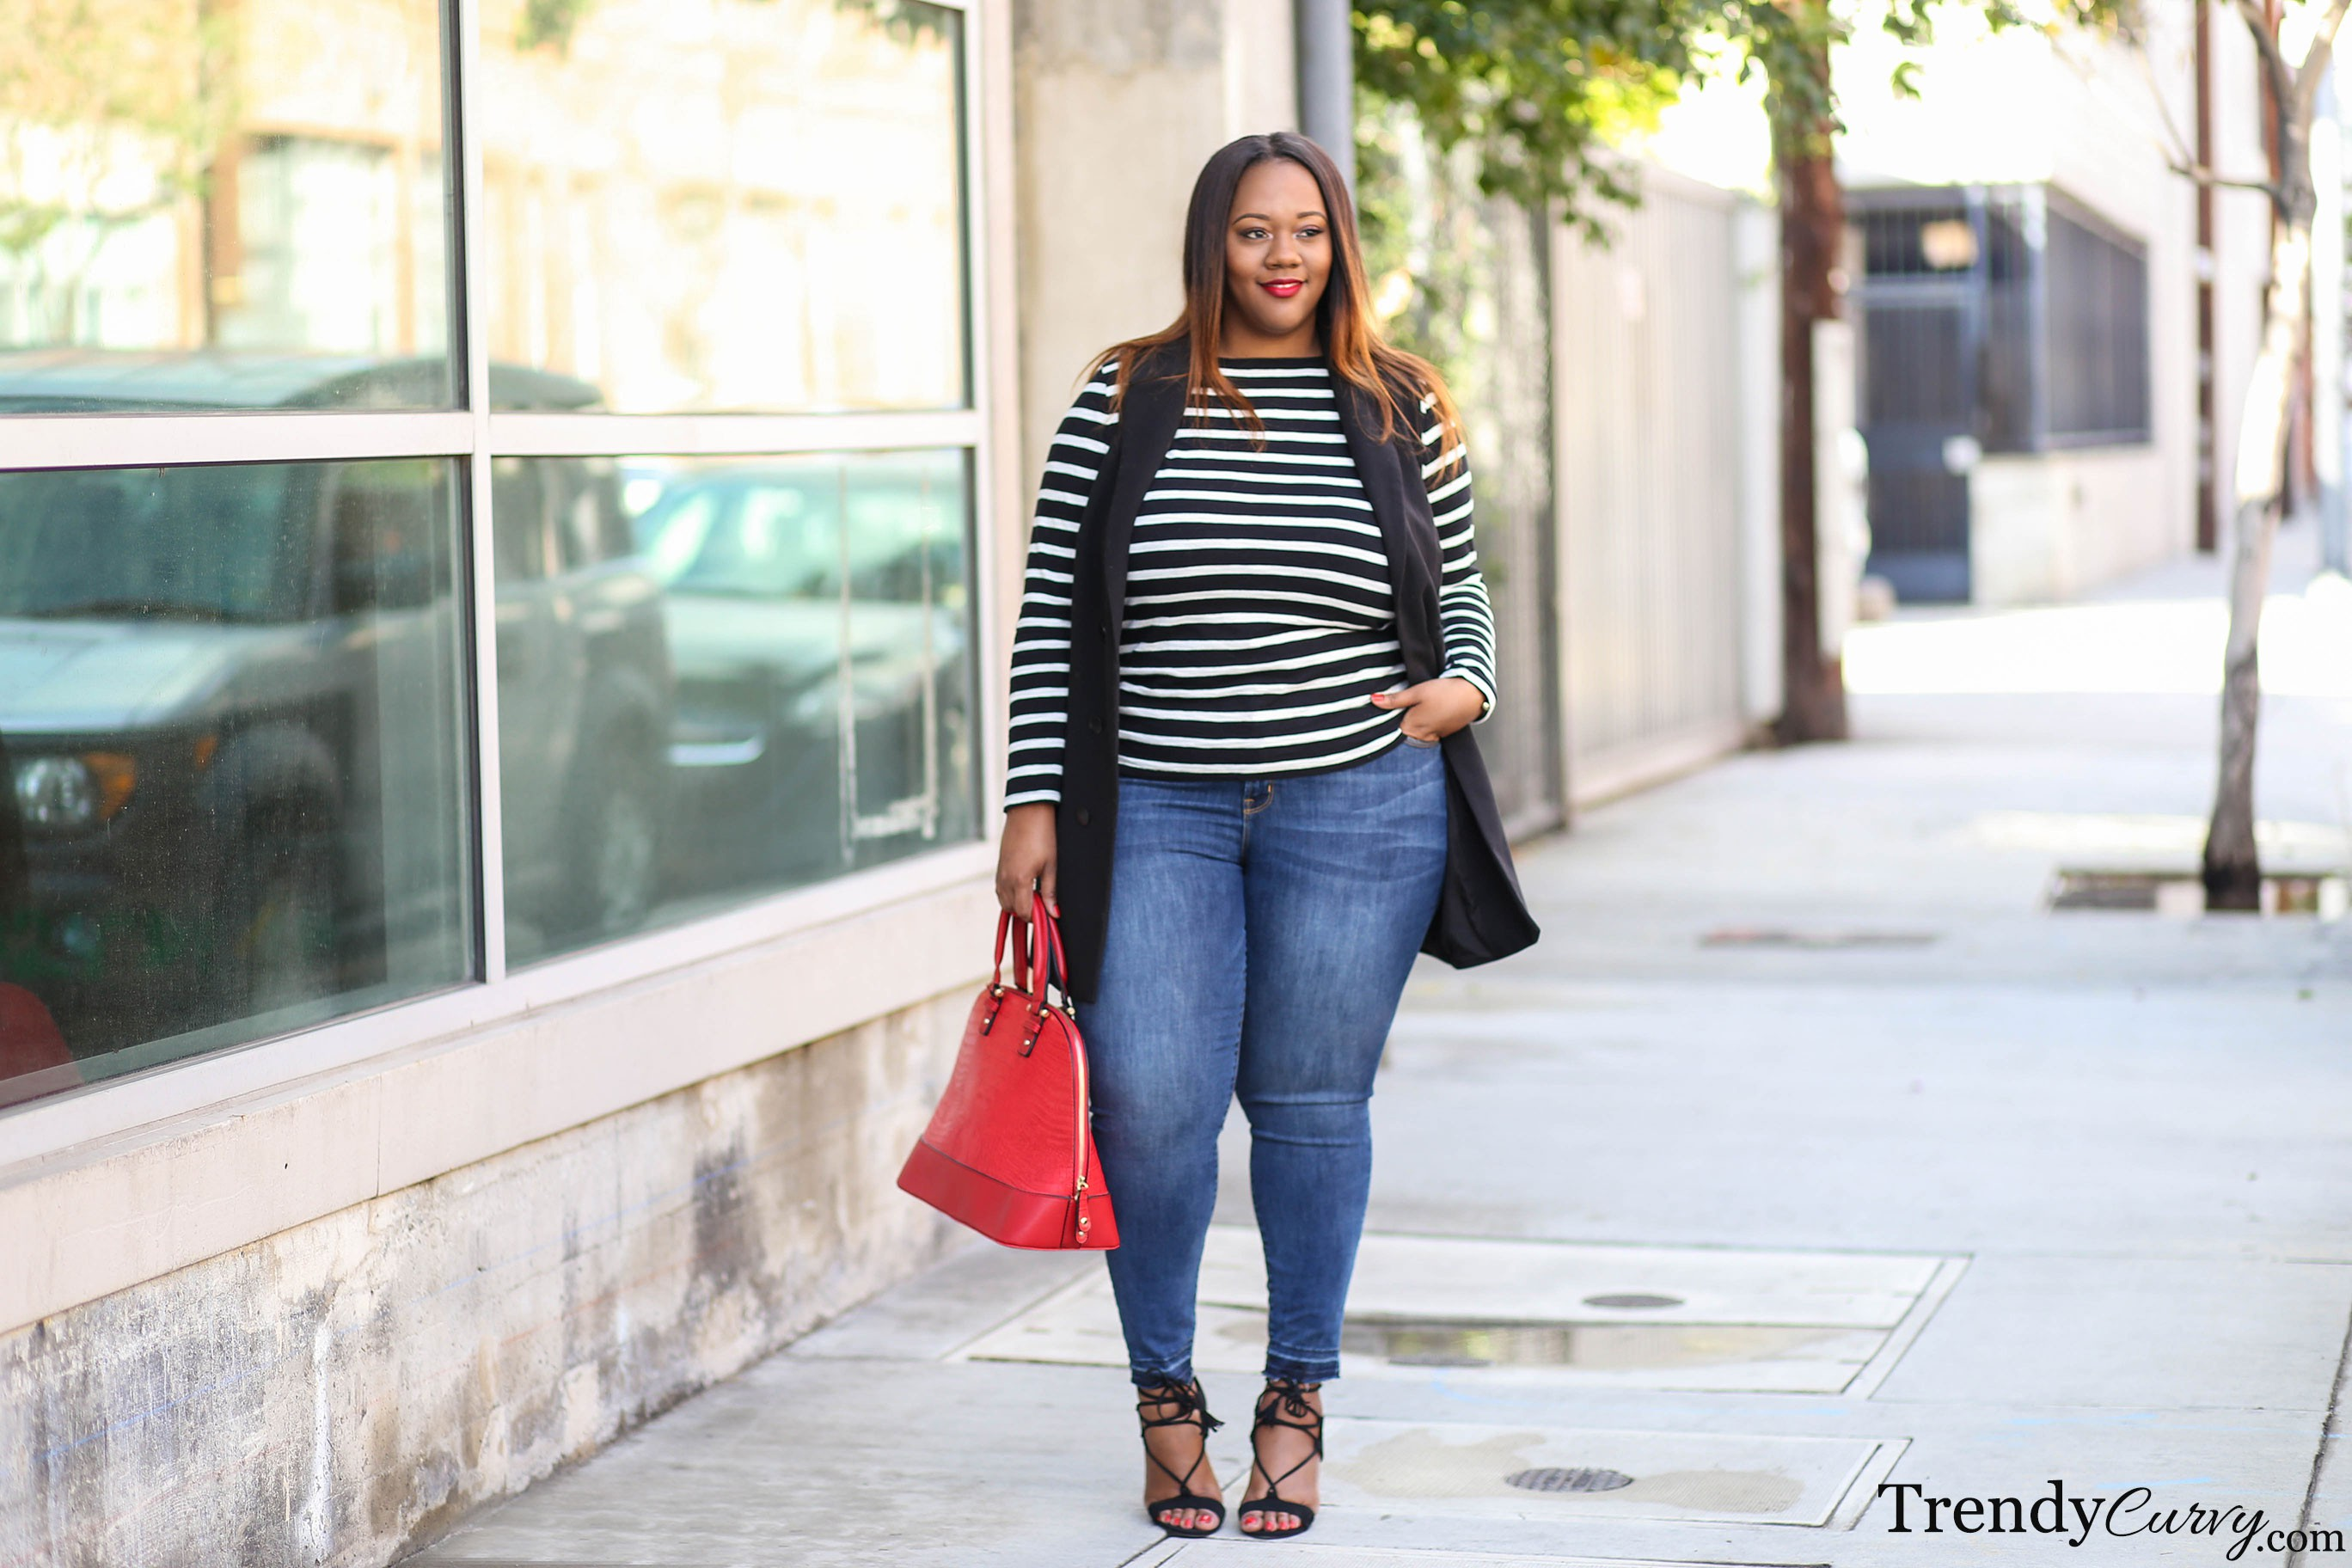 Street Fashion Blogs Like Watching >> The Usa Fashion Bloggers You Need To Follow